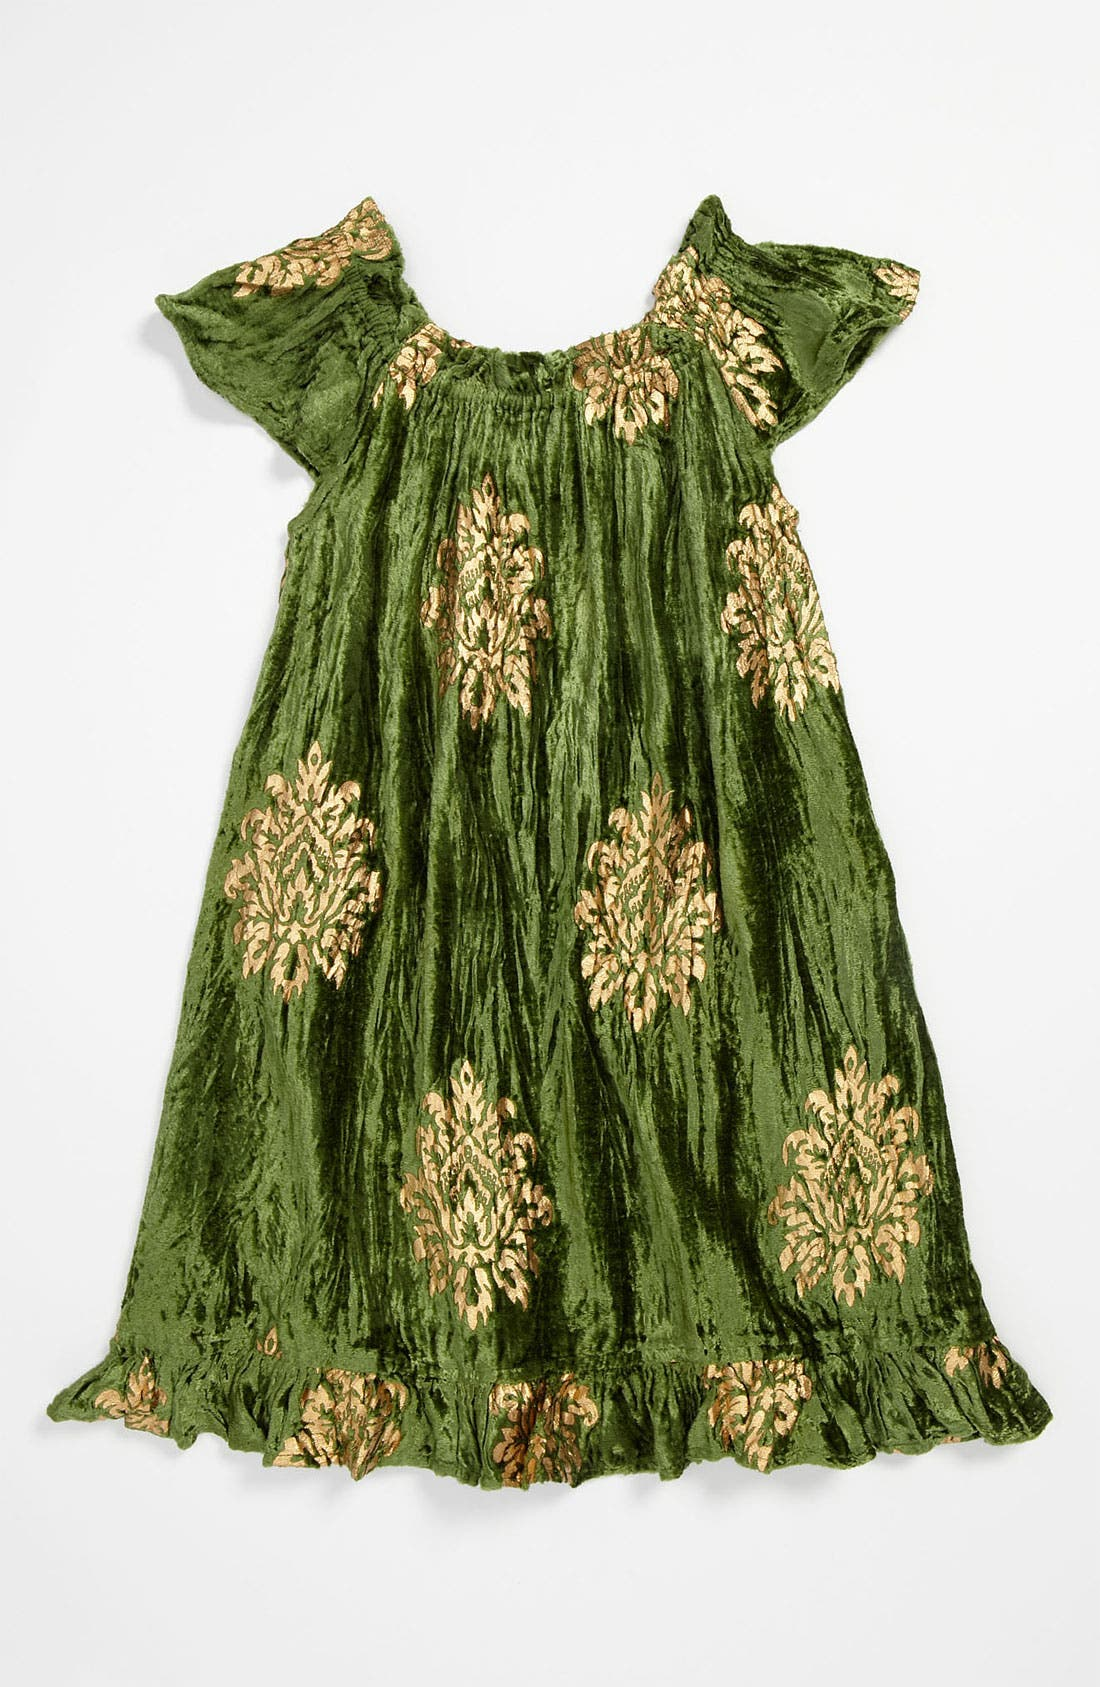 Alternate Image 1 Selected - Peek 'Astor' Dress (Toddler, Little Girls & Big Girls)